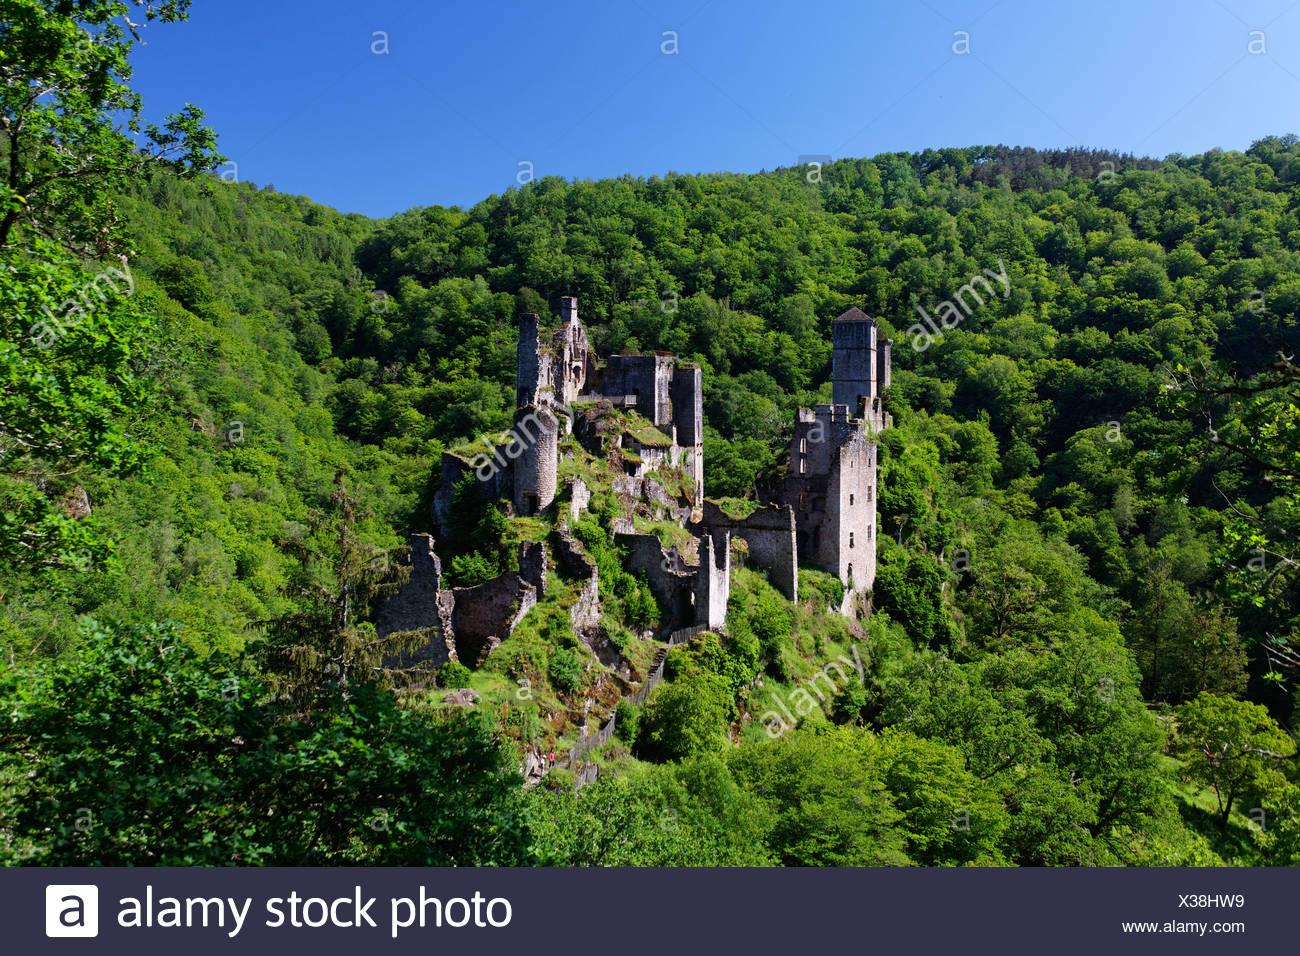 Tours de Merle, Merle towers, Dordogne valley, Correze, Limousin, France, Europe - Stock Image